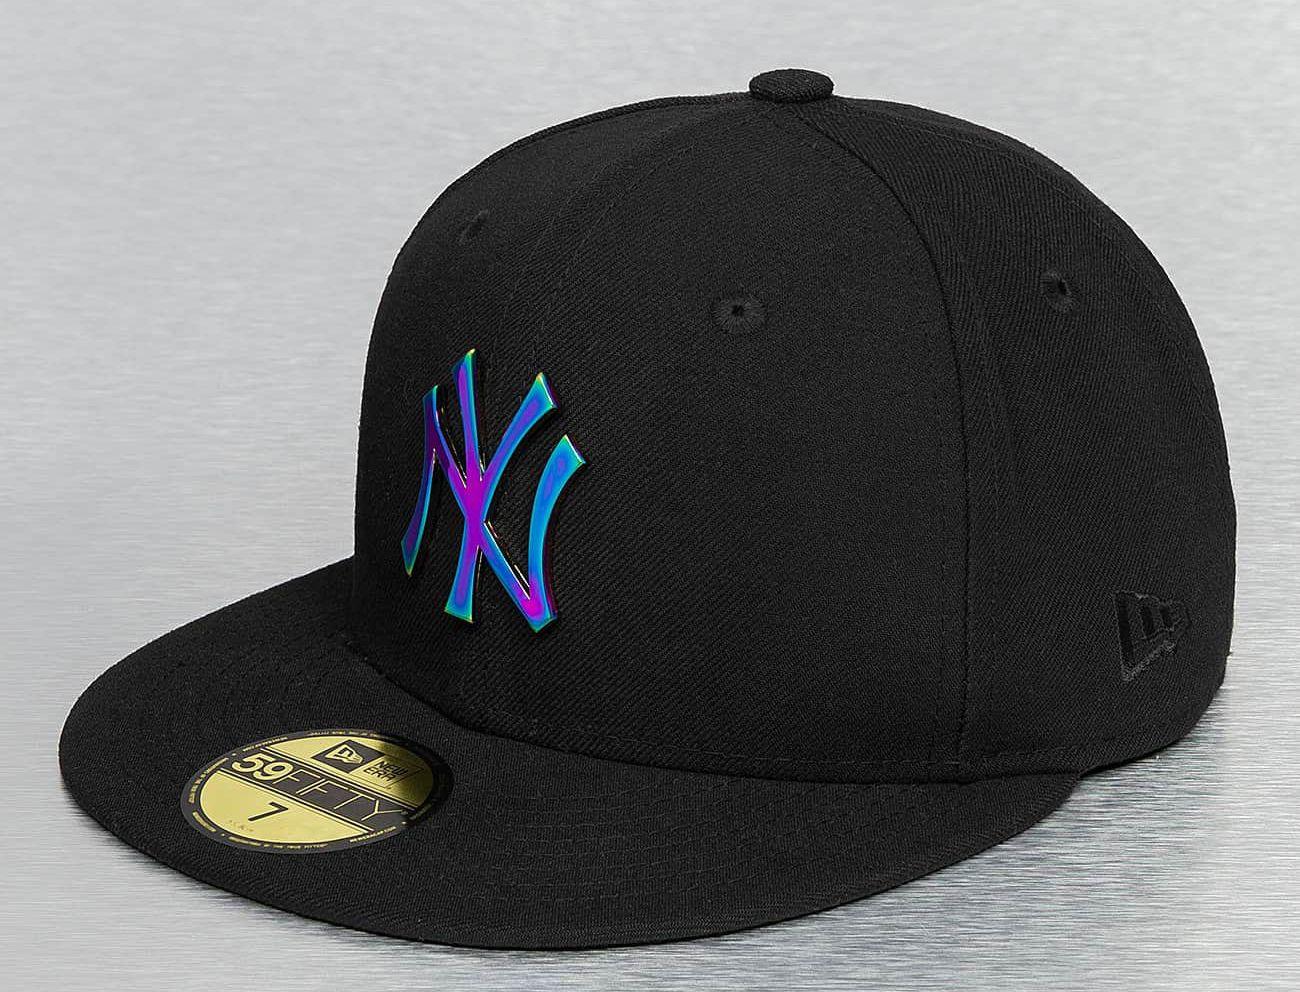 New York Yankees Rainbow Badge 59fifty Fitted Baseball Cap By New Era X Mlb Fitted Baseball Caps Baseball Cap New Era